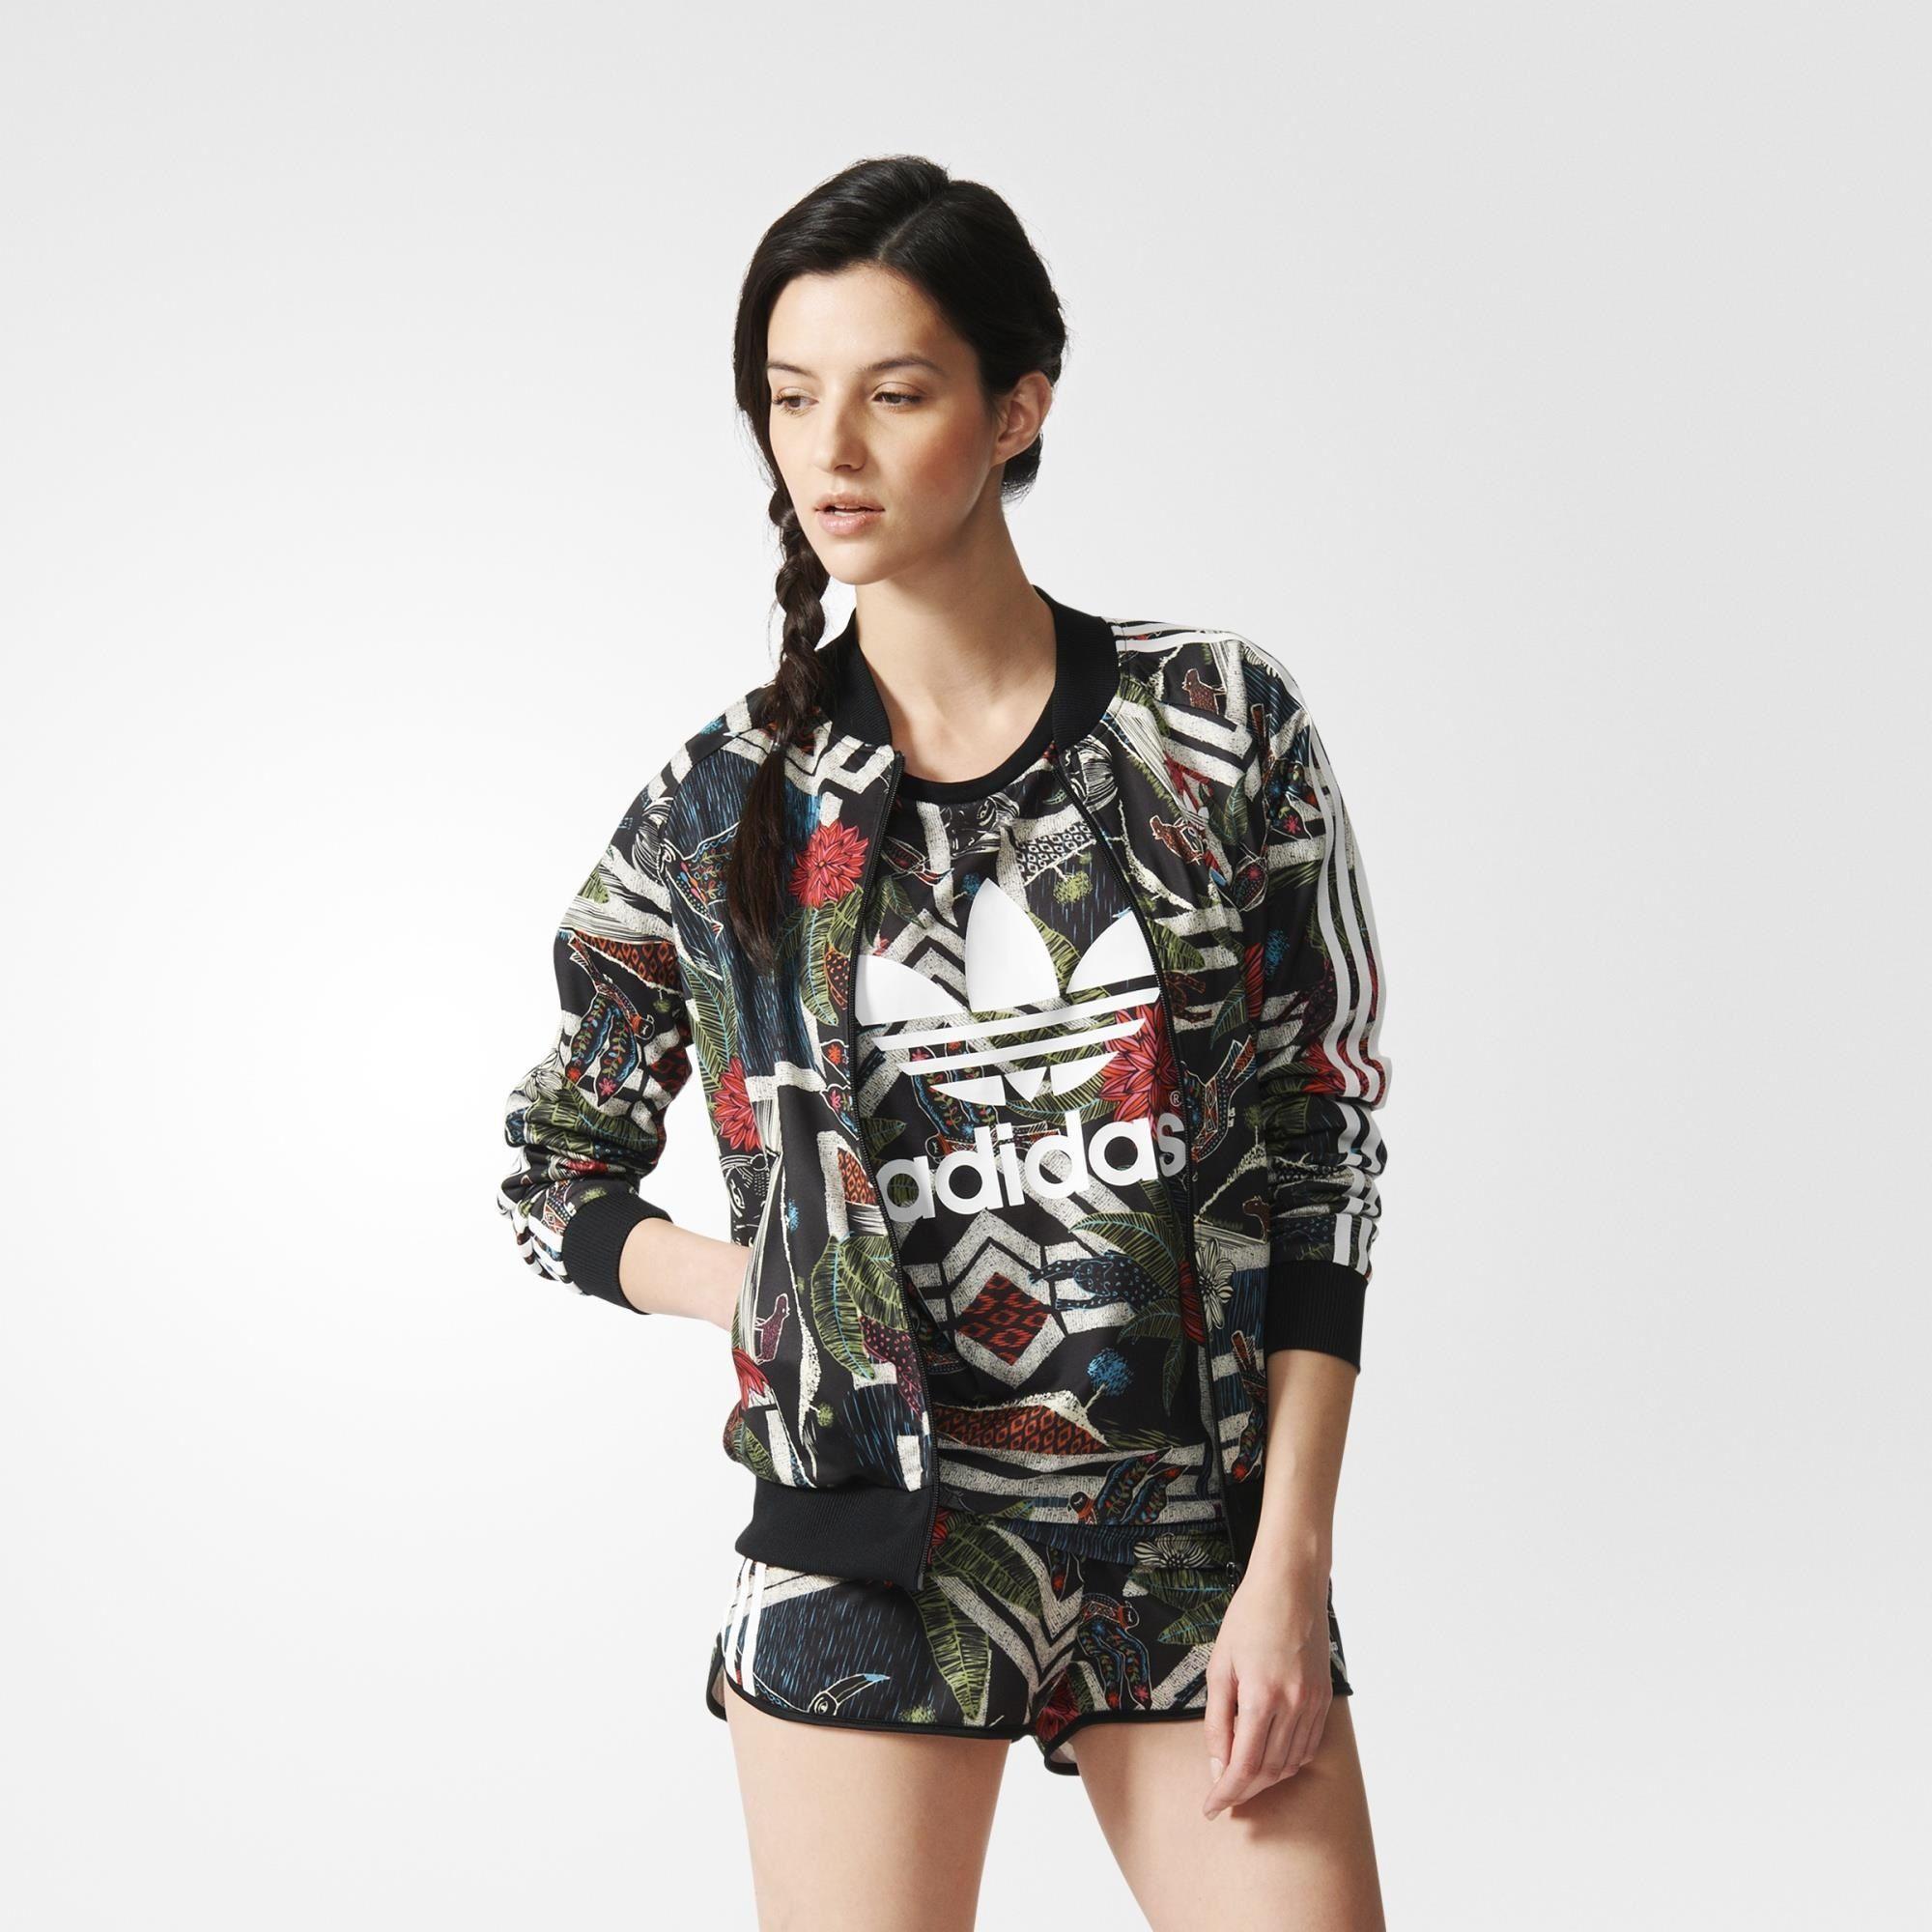 buy online 334a8 b8bc5 adidas - Farm Curso d Agua Superstar Track Top